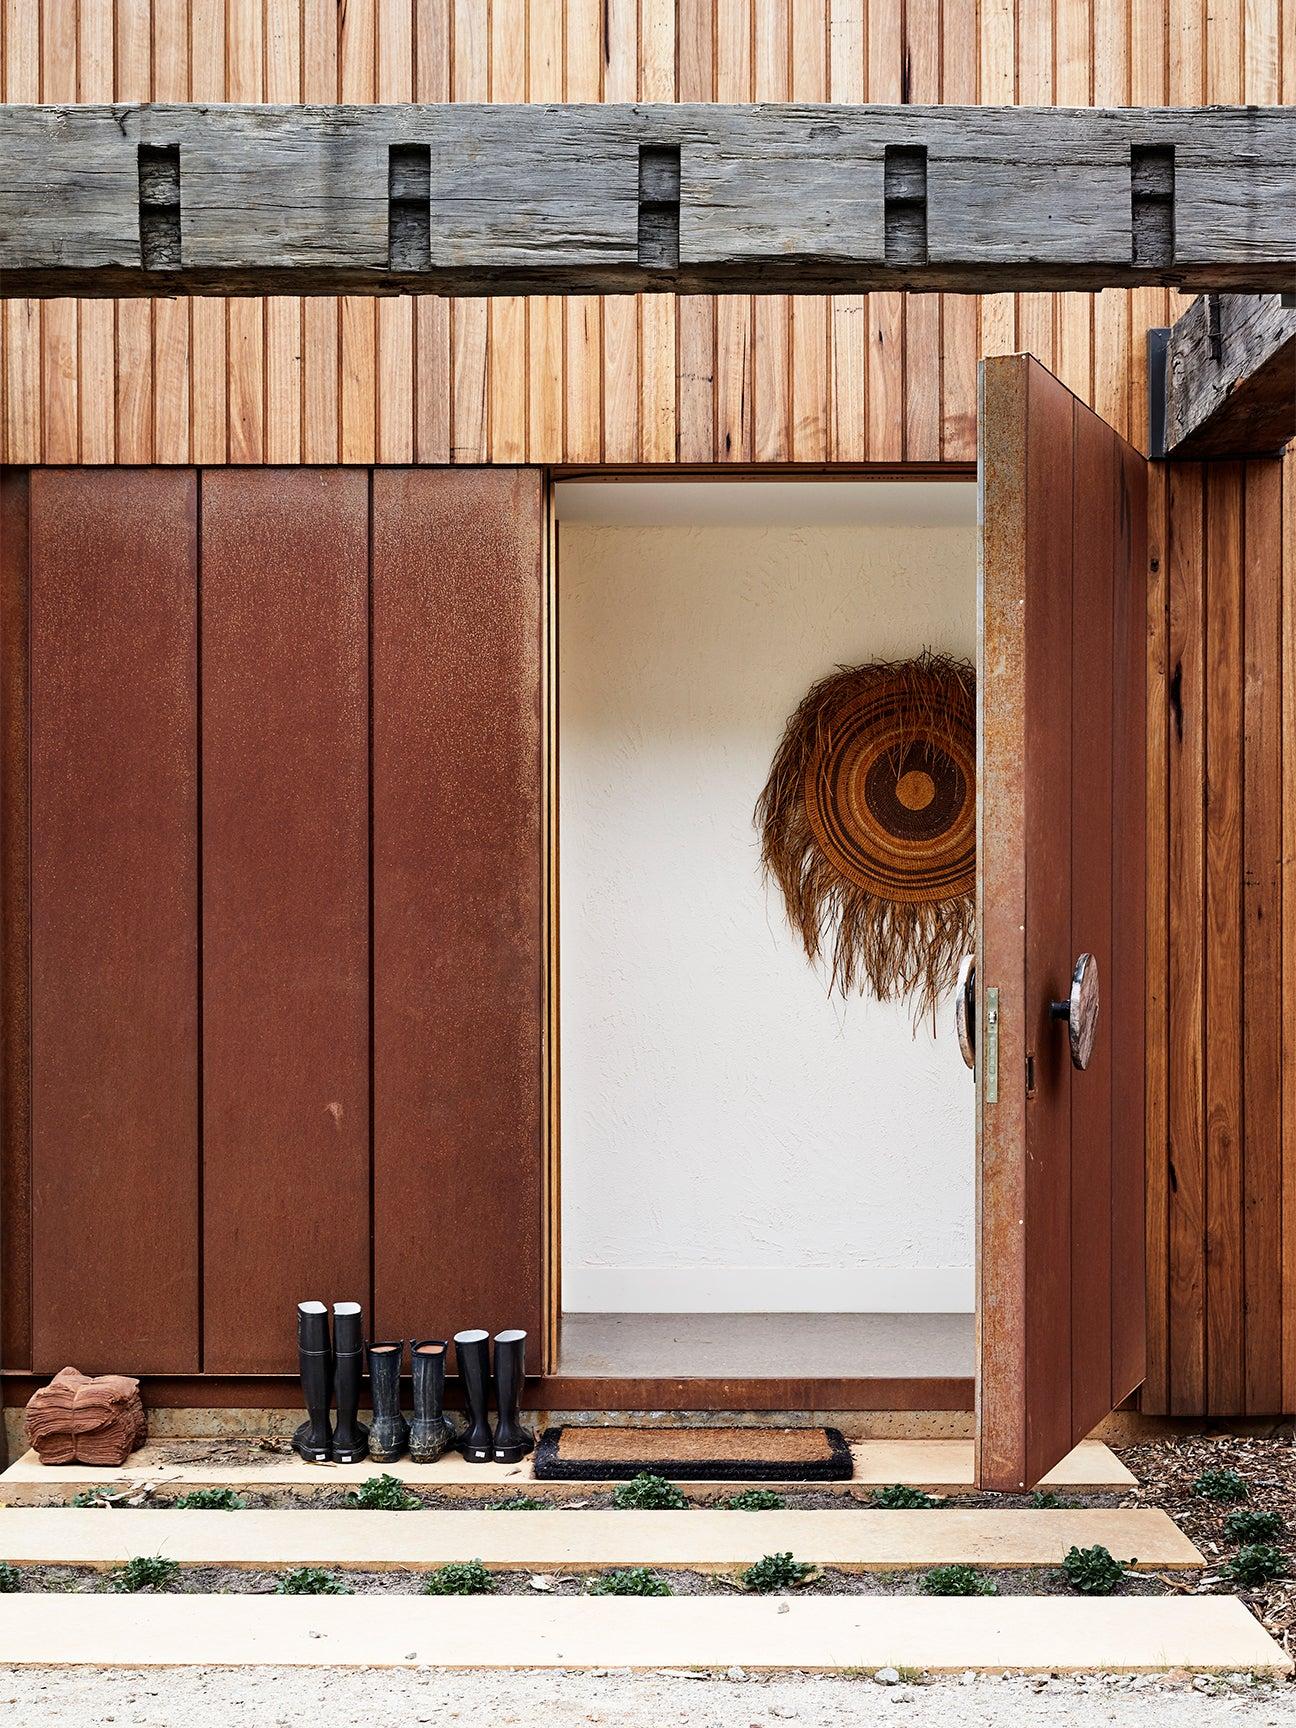 Oxidized rust doors